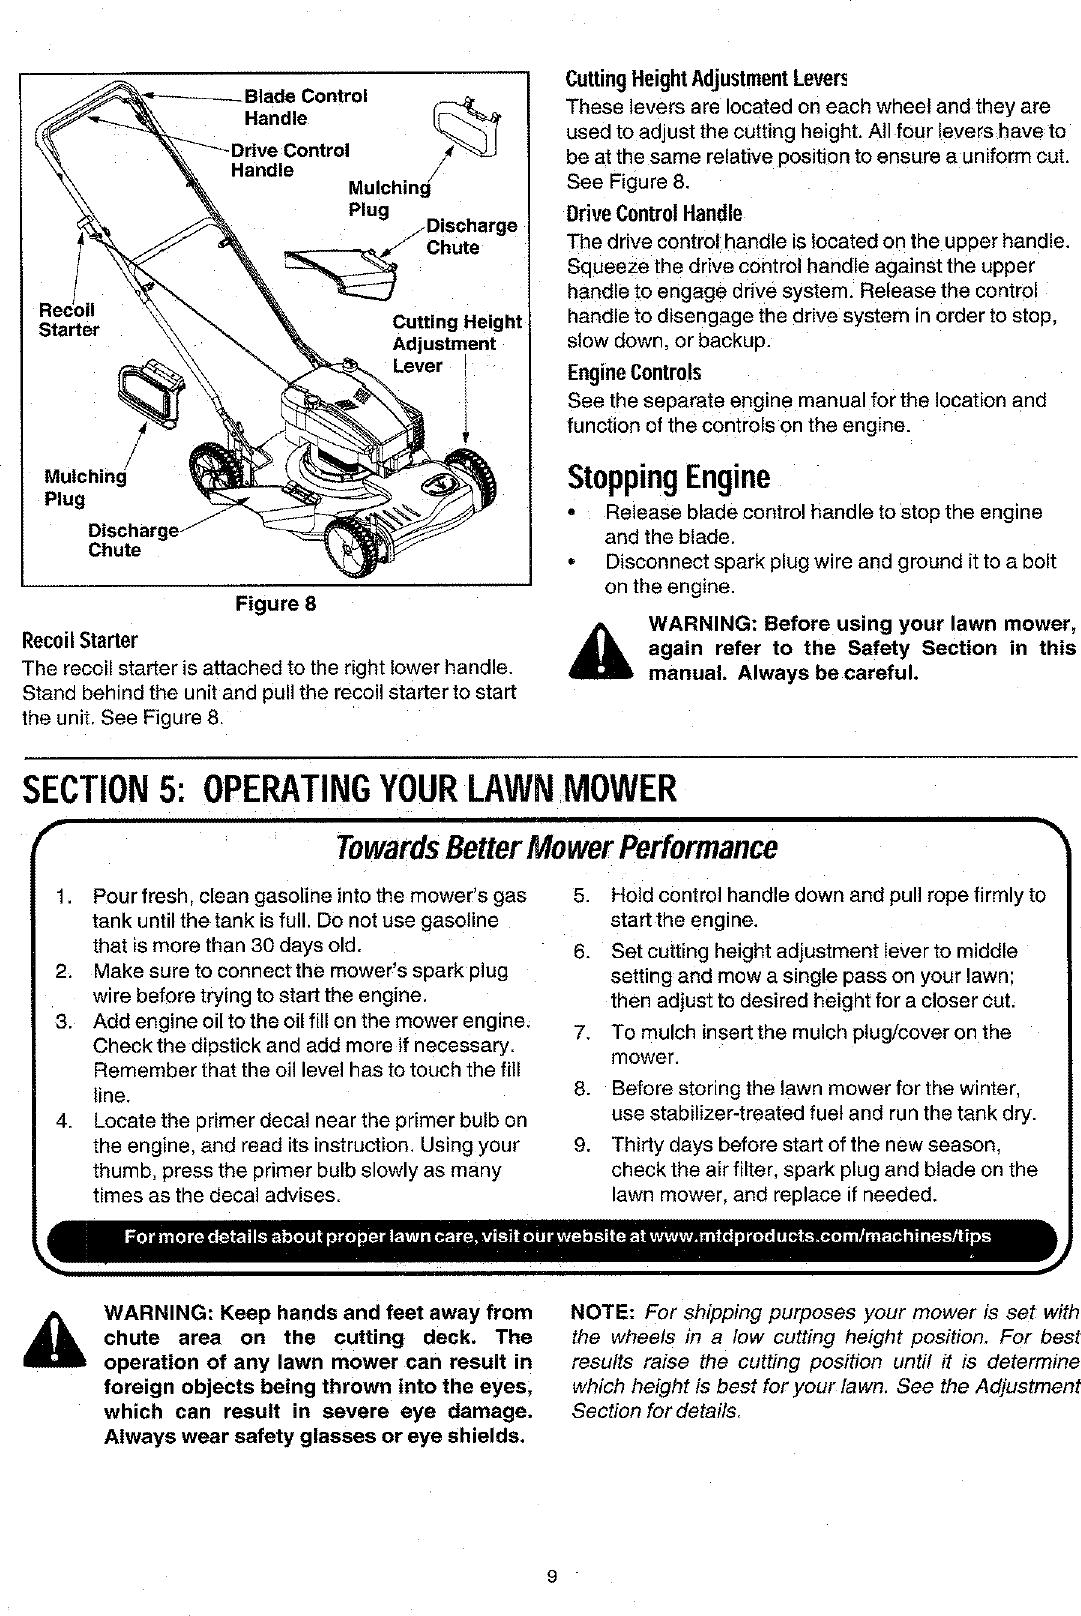 MTD 12B 264C062 User Manual LAWN MOWER Manuals And Guides